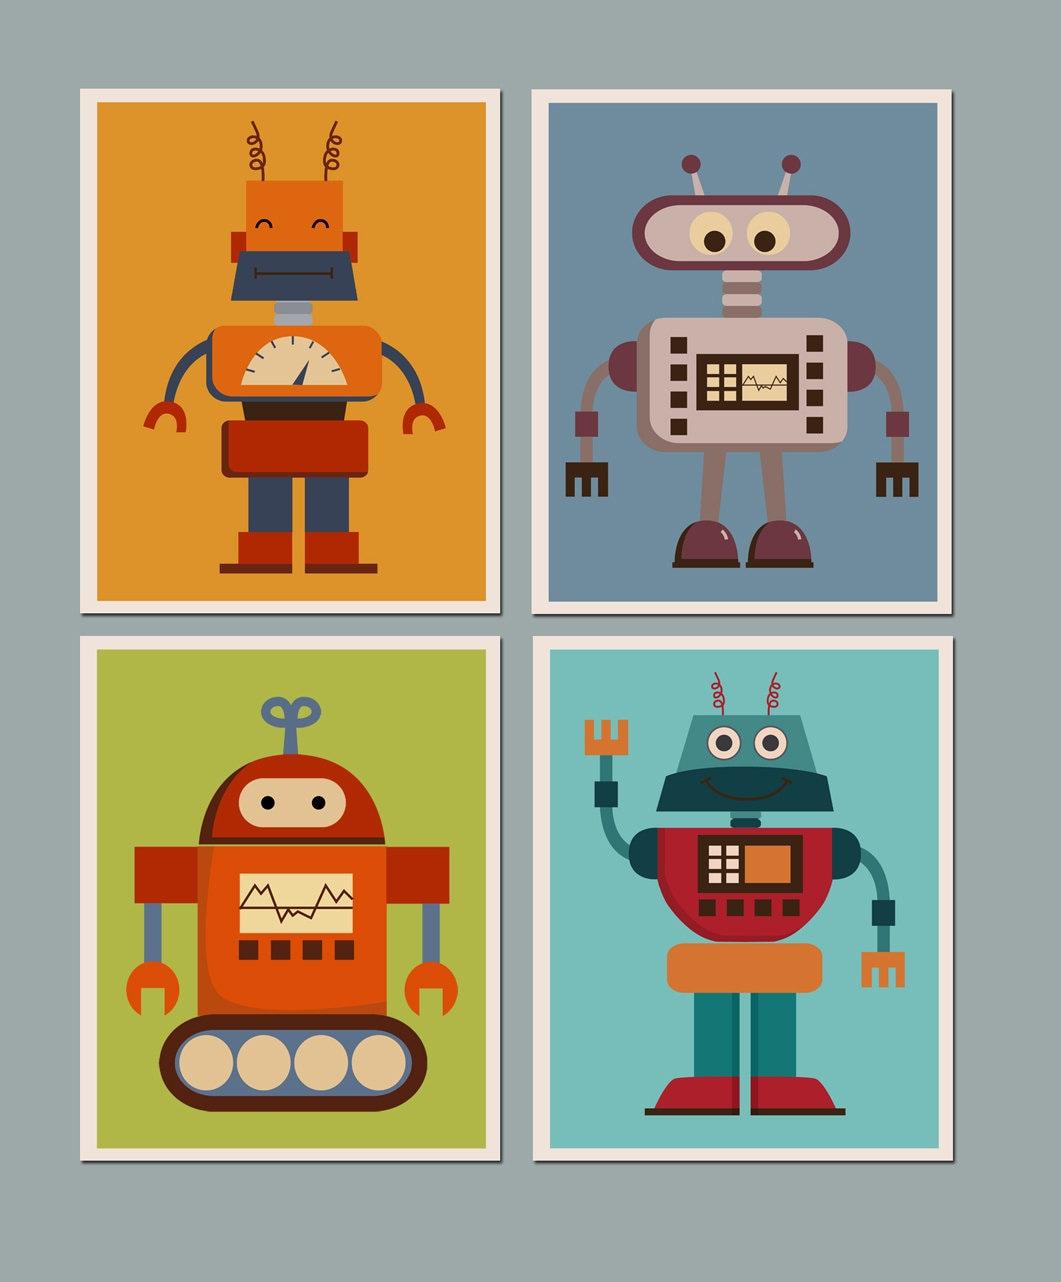 Blackboard Wall Stickers Robots Printable Art Inspirational Prints Kids Wall By